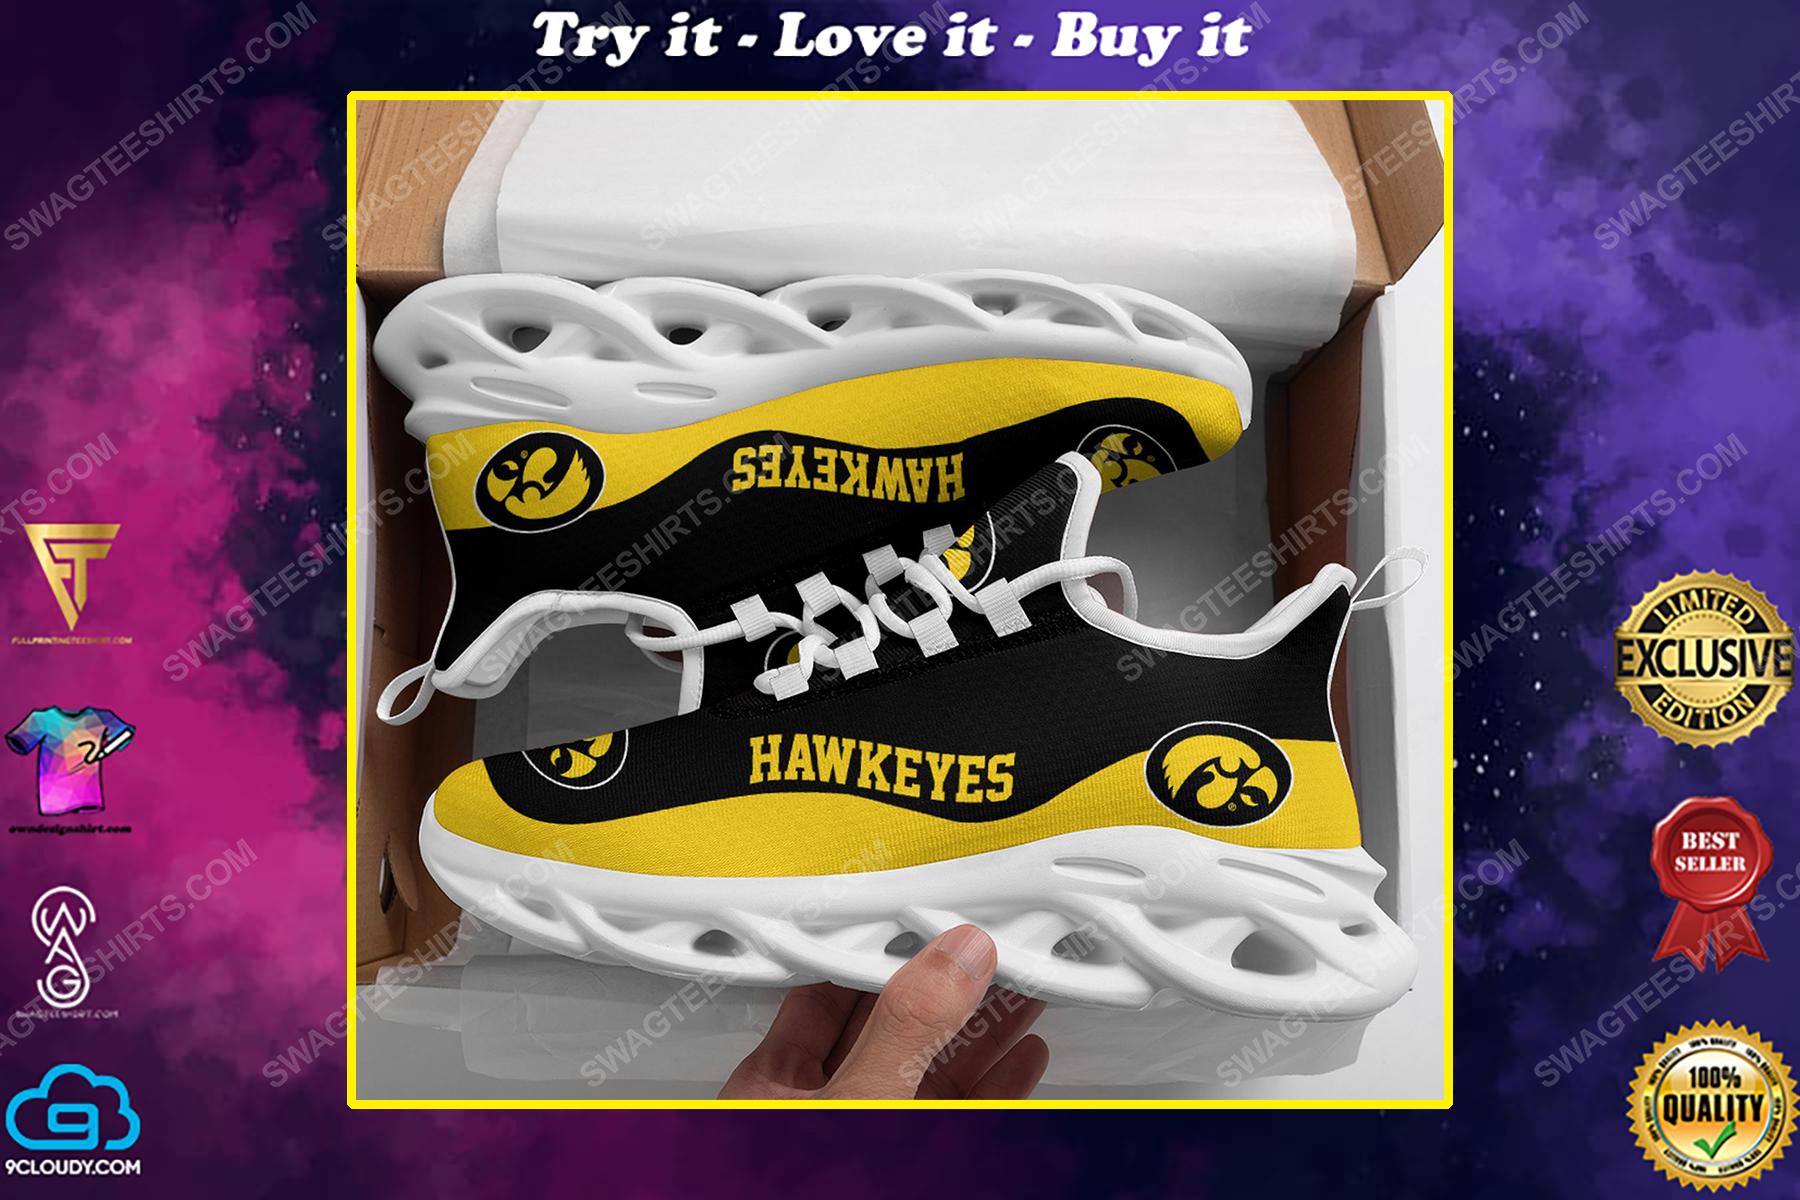 The iowa hawkeyes football team max soul shoes